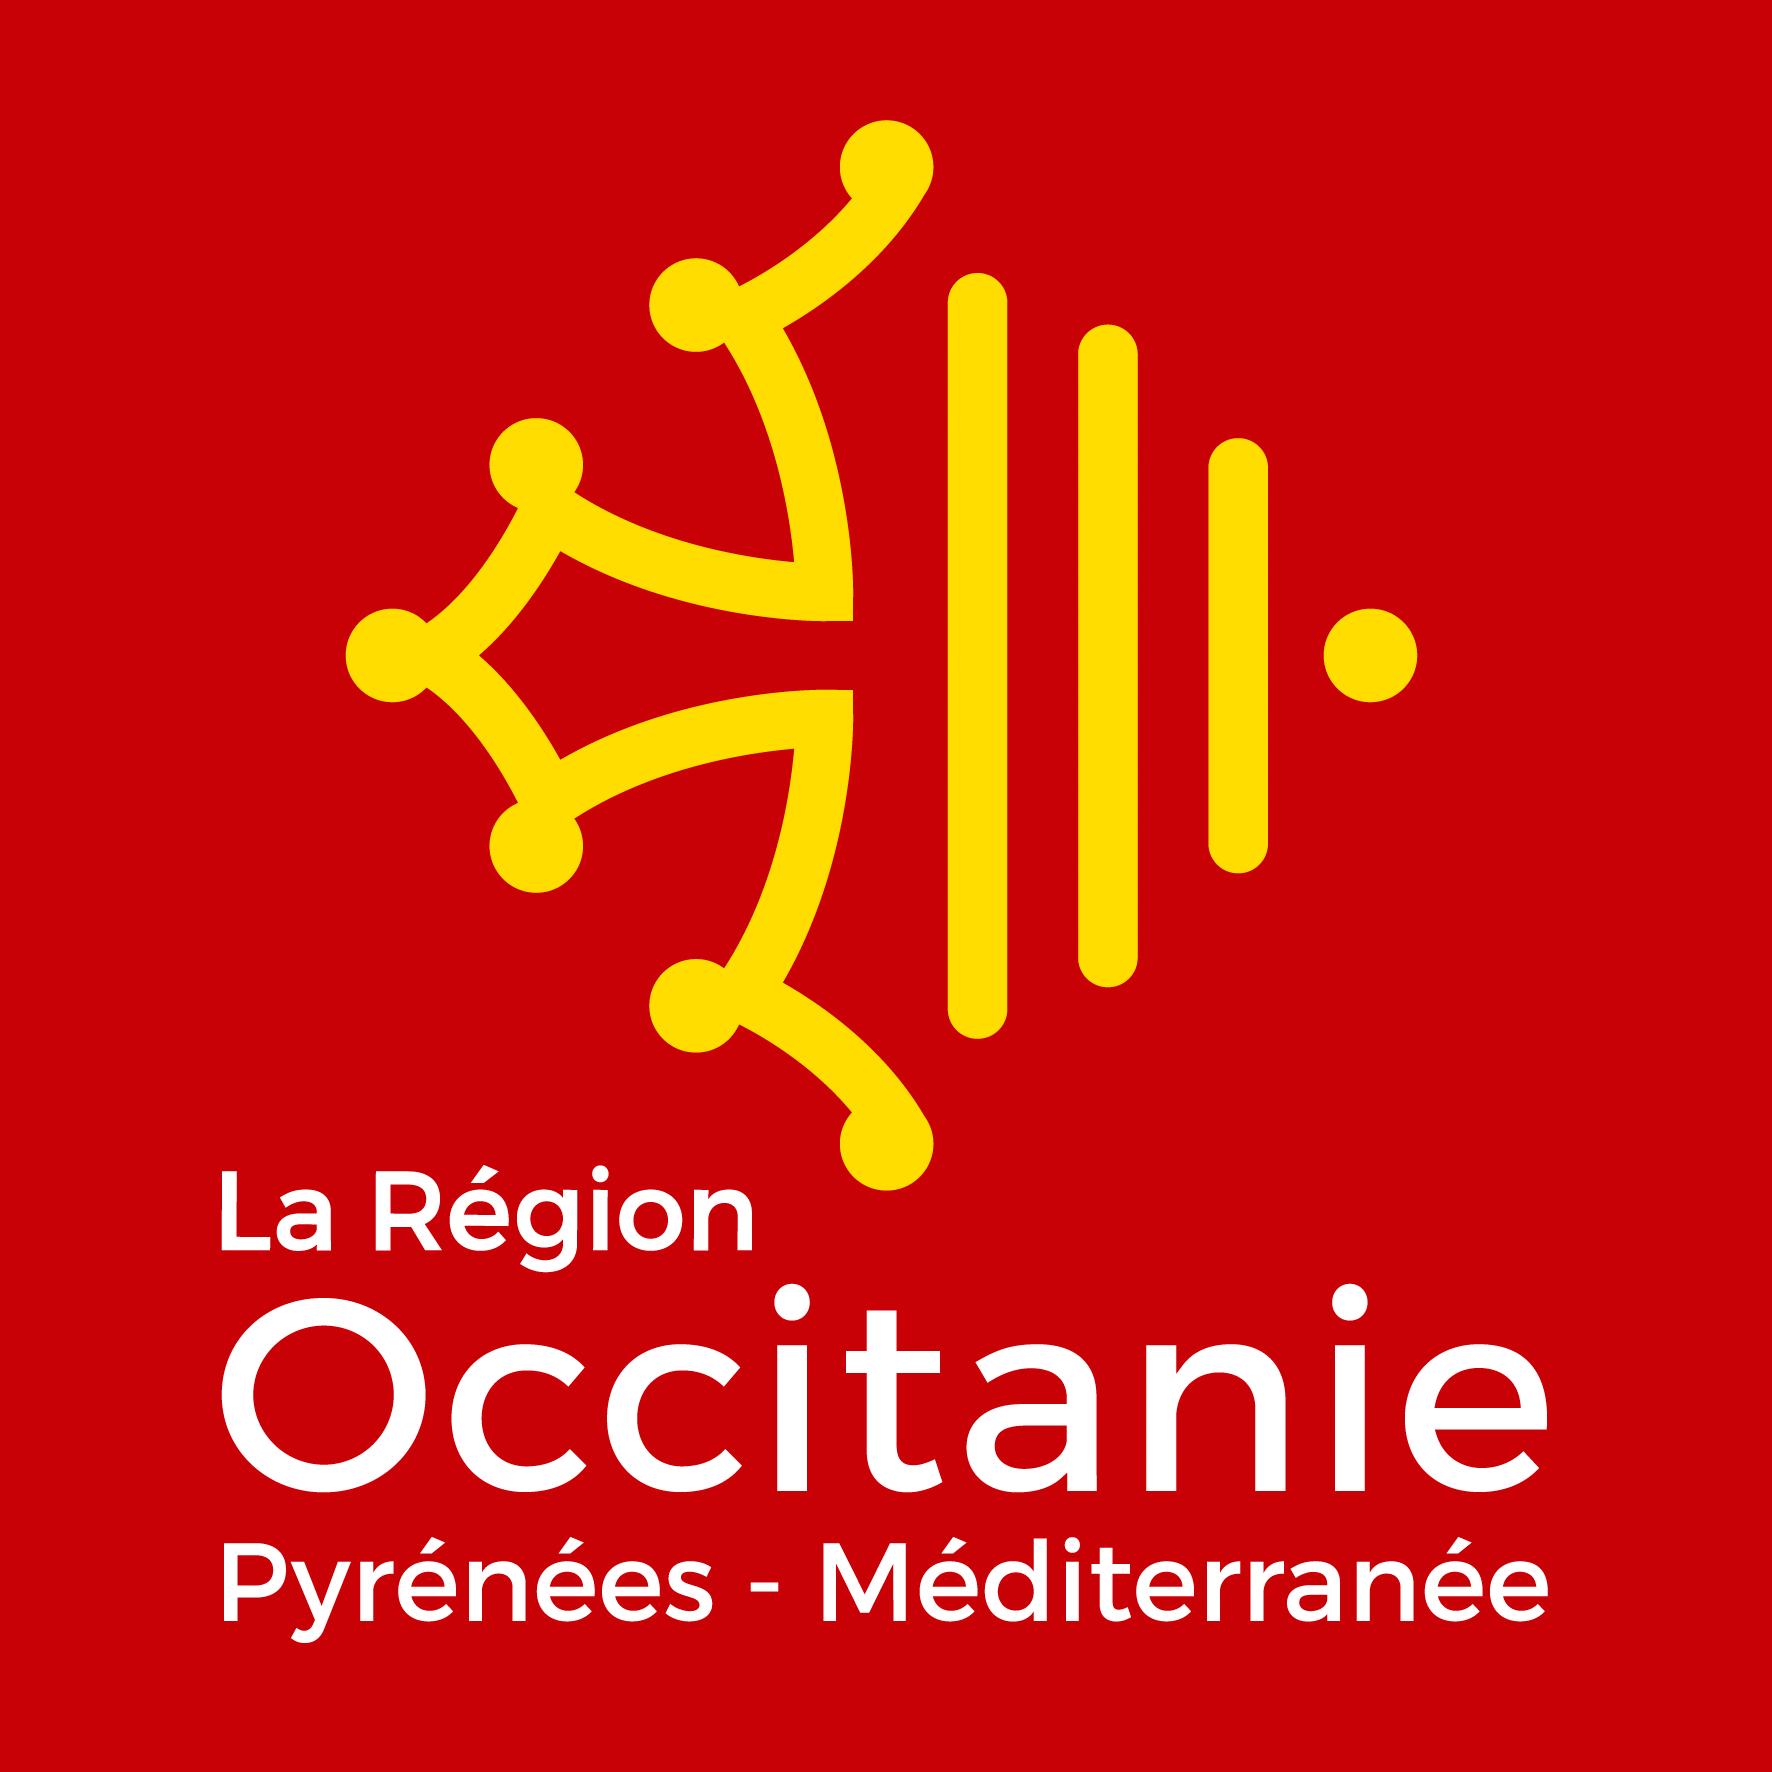 OC-1702-instit-logo carre-RVB-